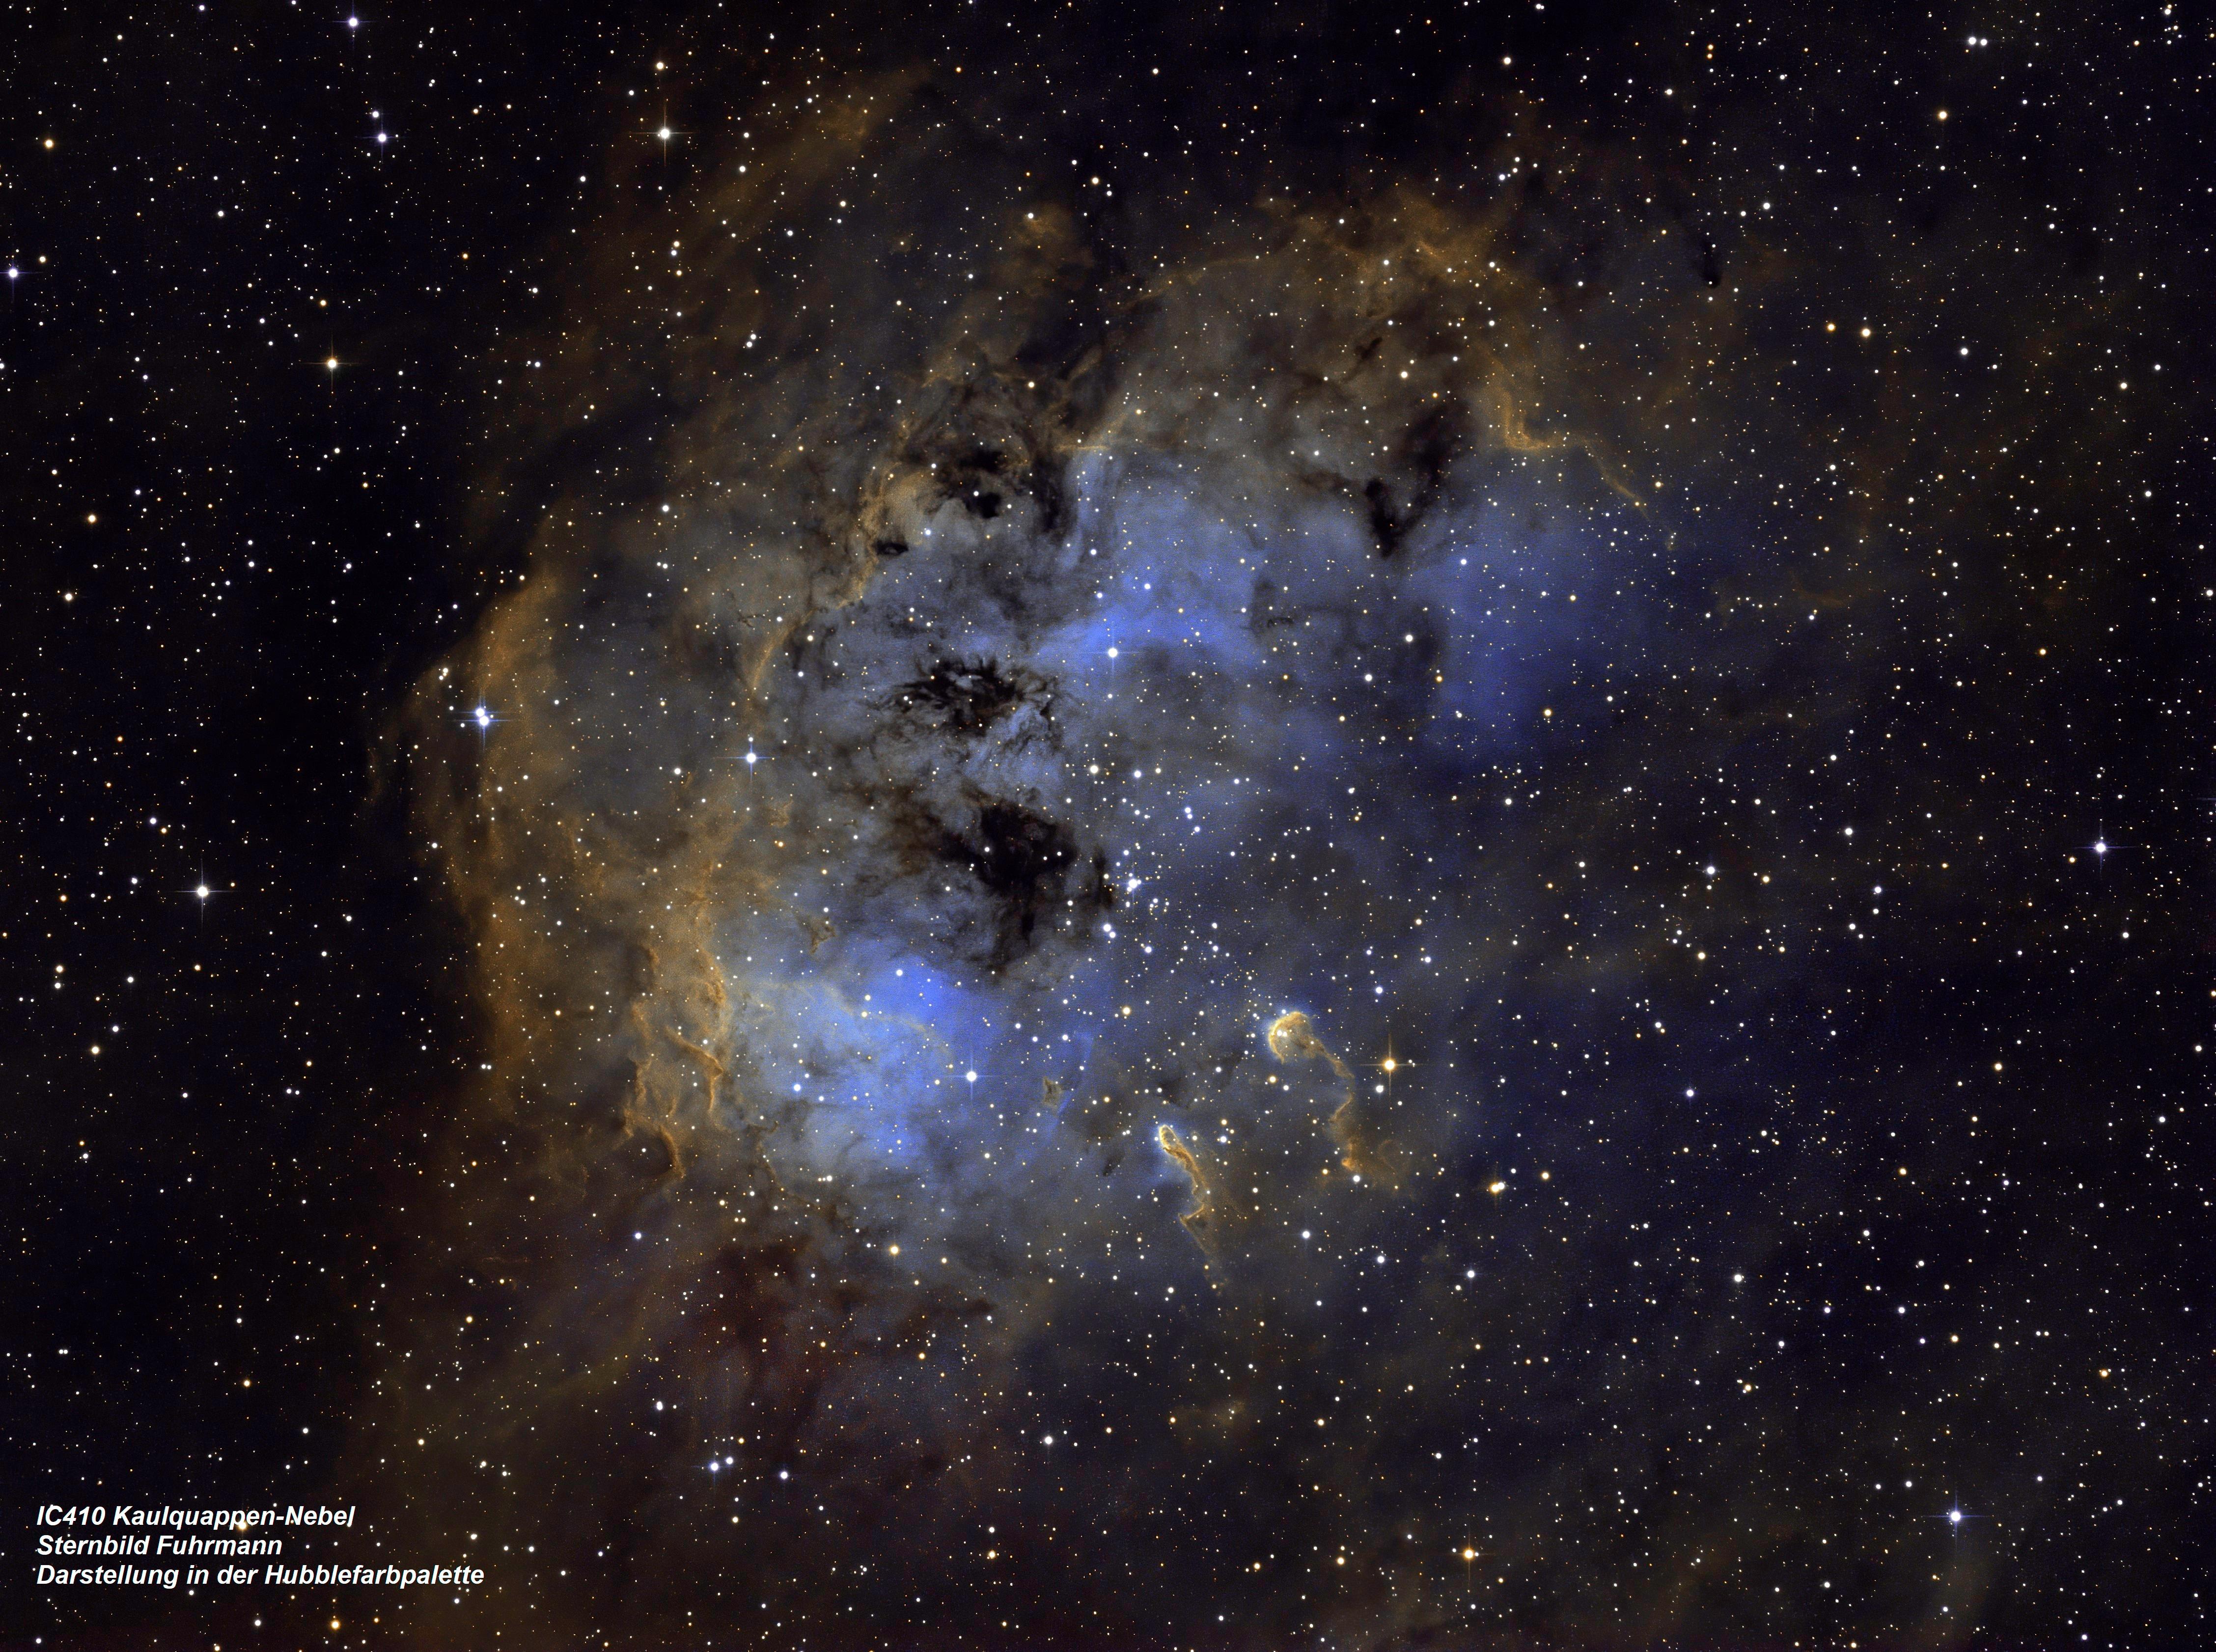 IC410 Kaulquappen Nebel (Hubble-Farbpalette)